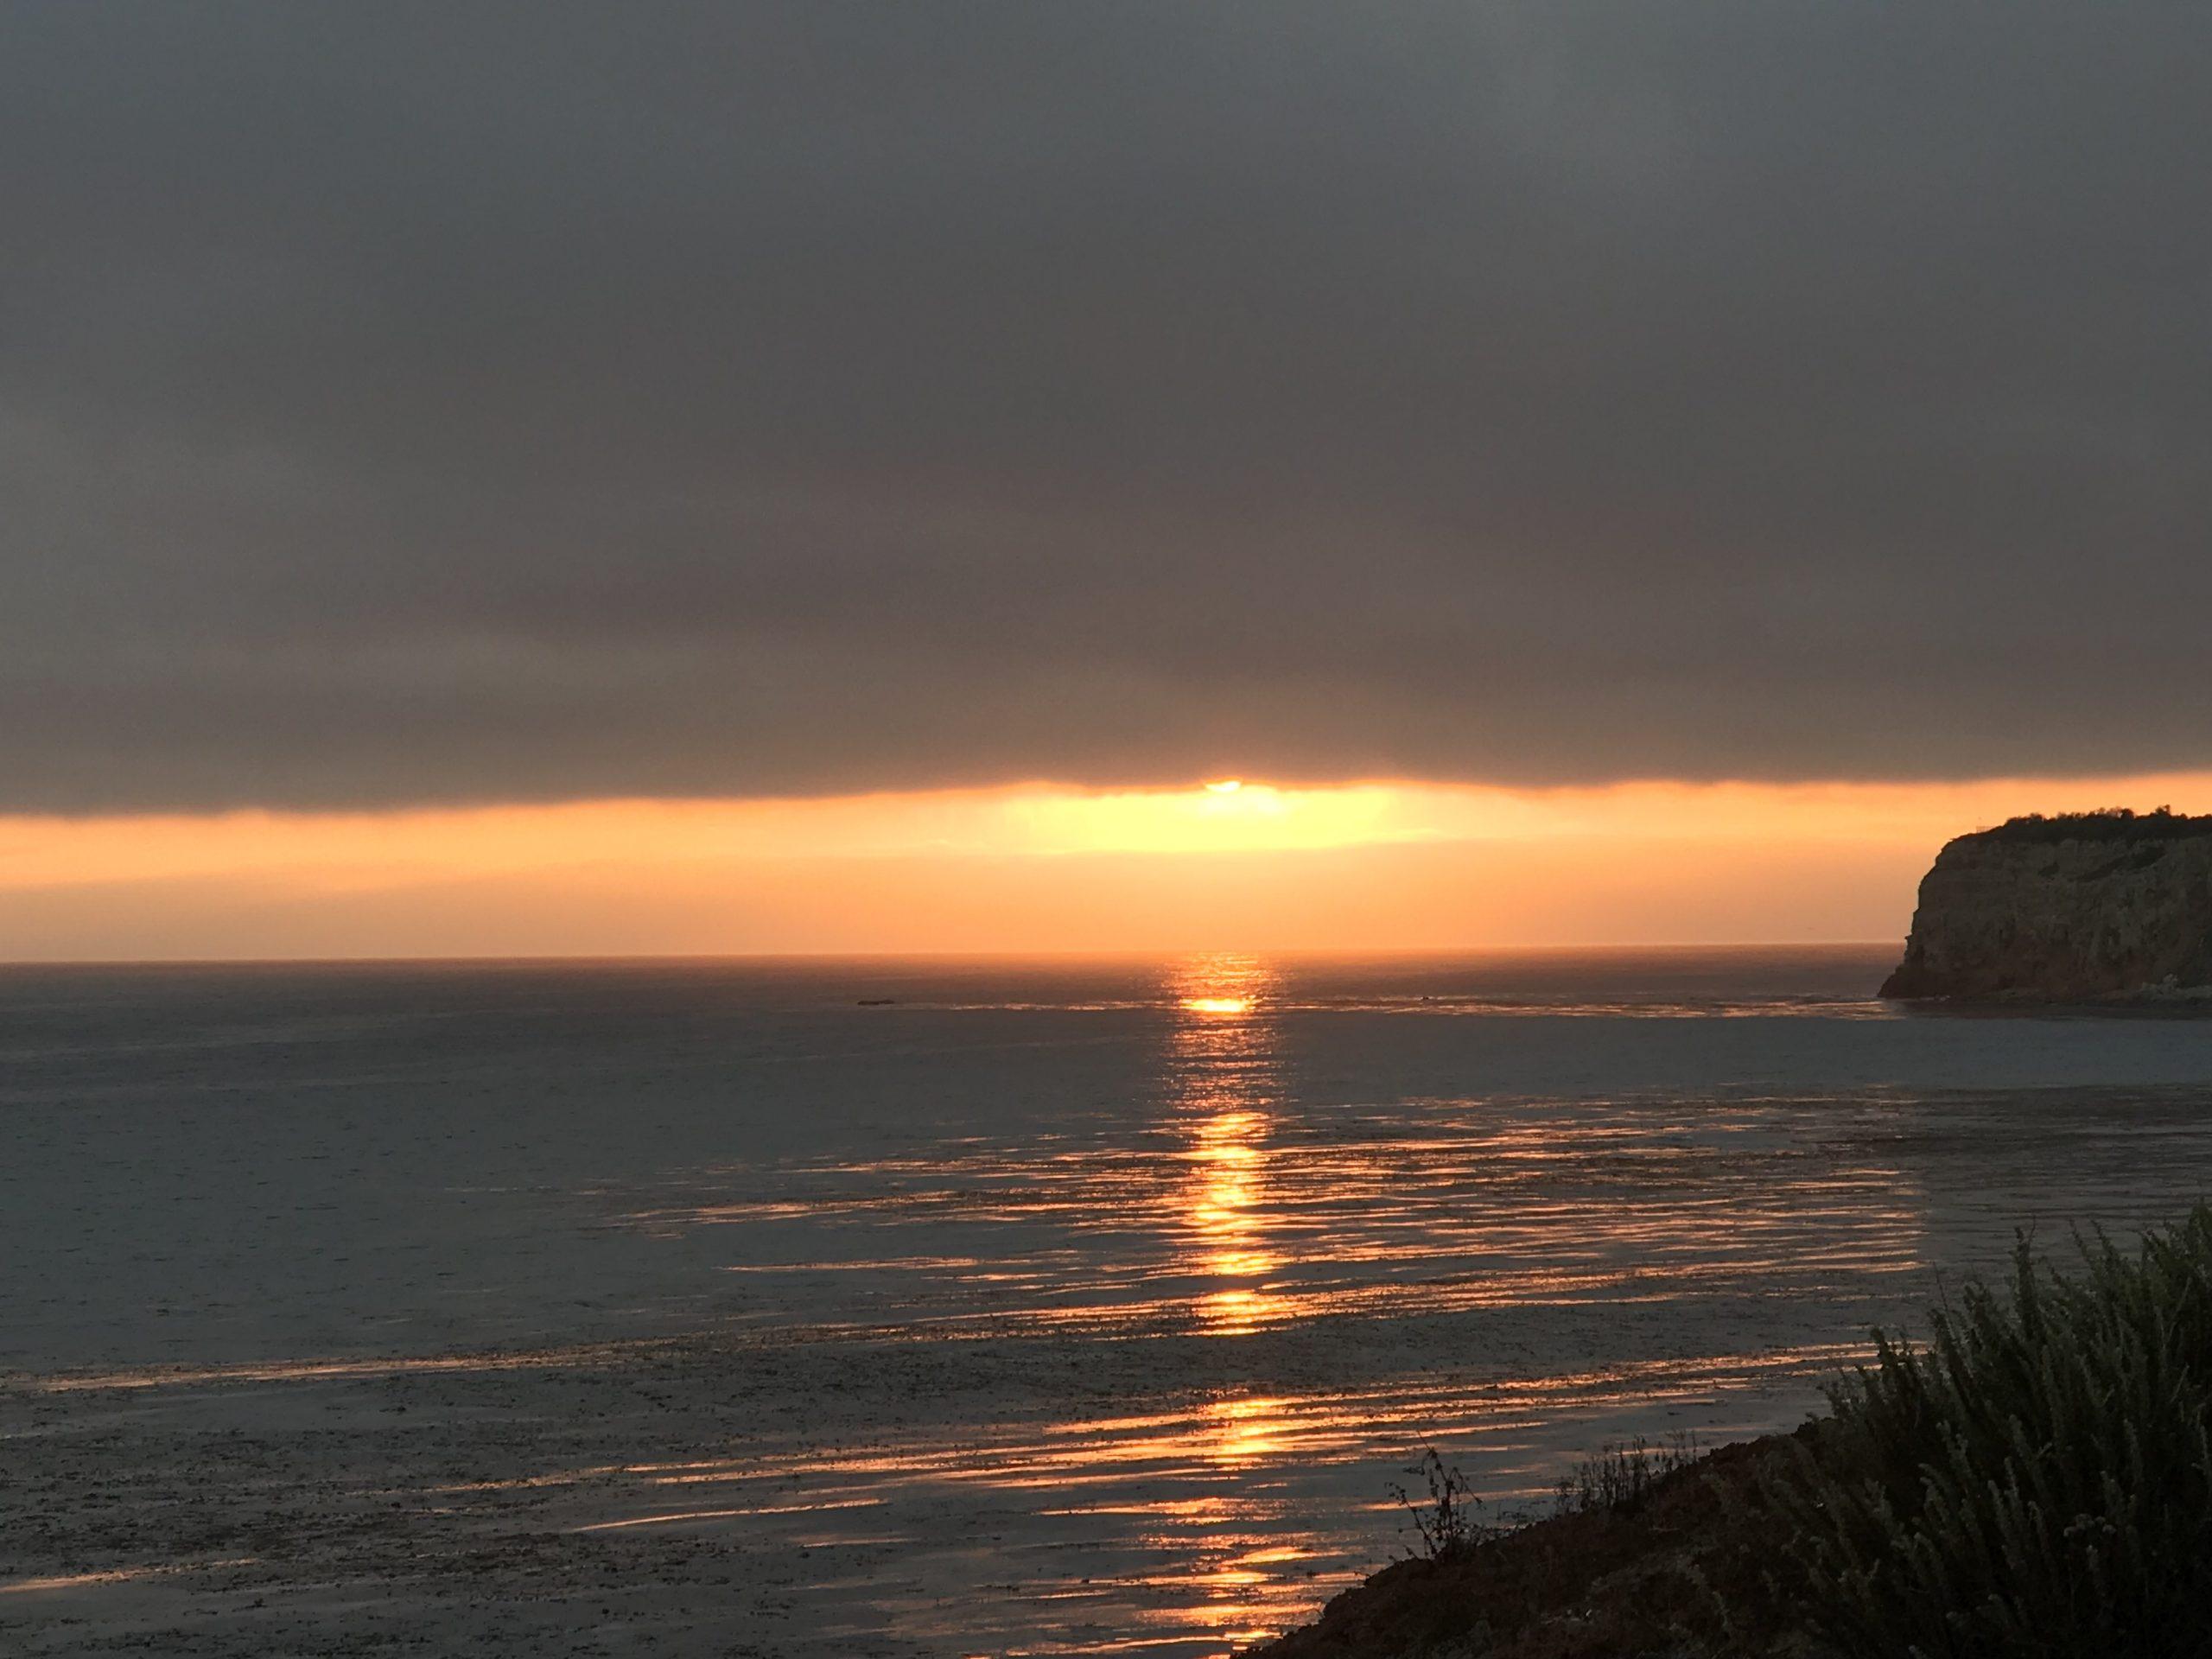 sunset under cloudy skies at Terranea Resort